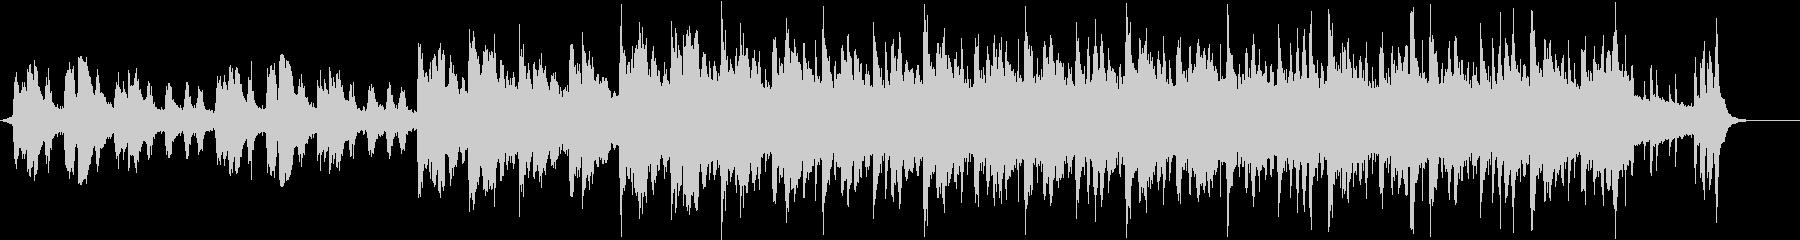 StringsとHerpの幻想的なBGMの未再生の波形